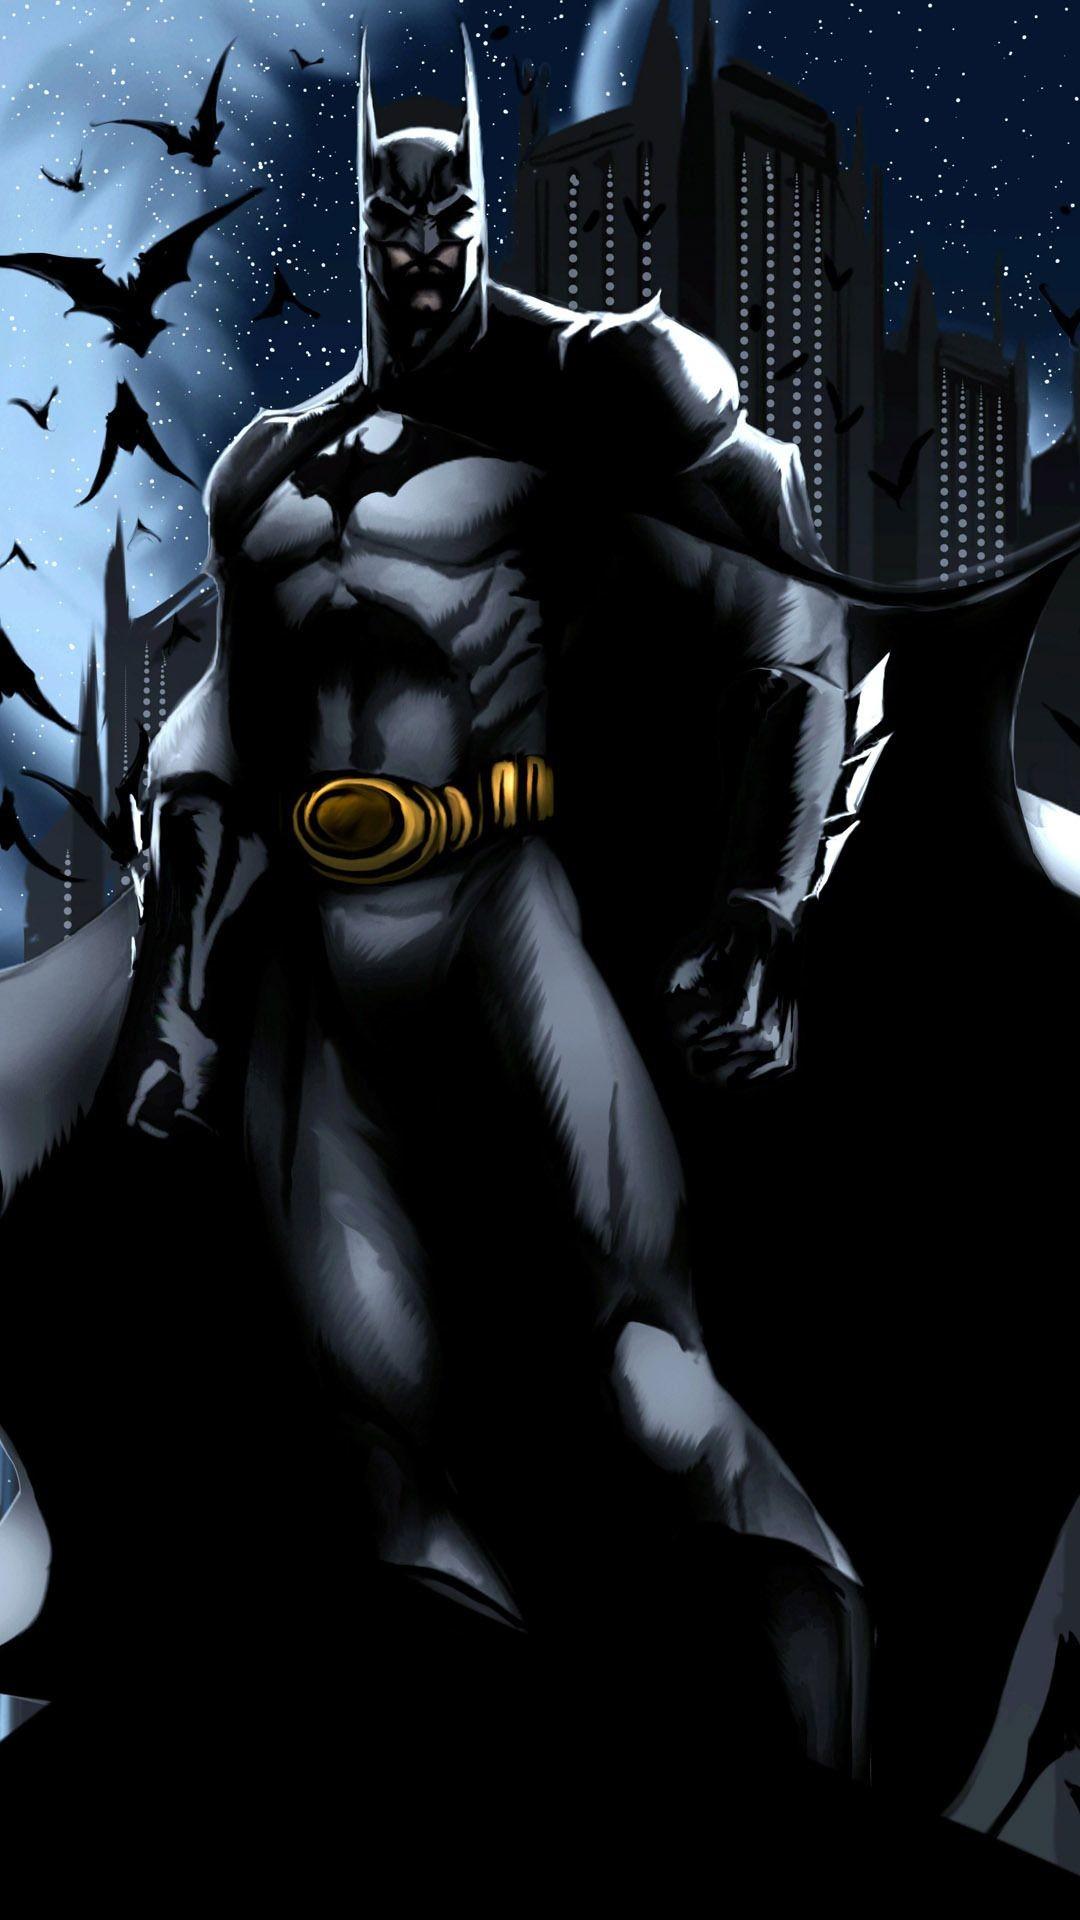 Res: 1080x1920, Batman Cartoon samsung galaxy Wallpaper HD Mobile × Batman